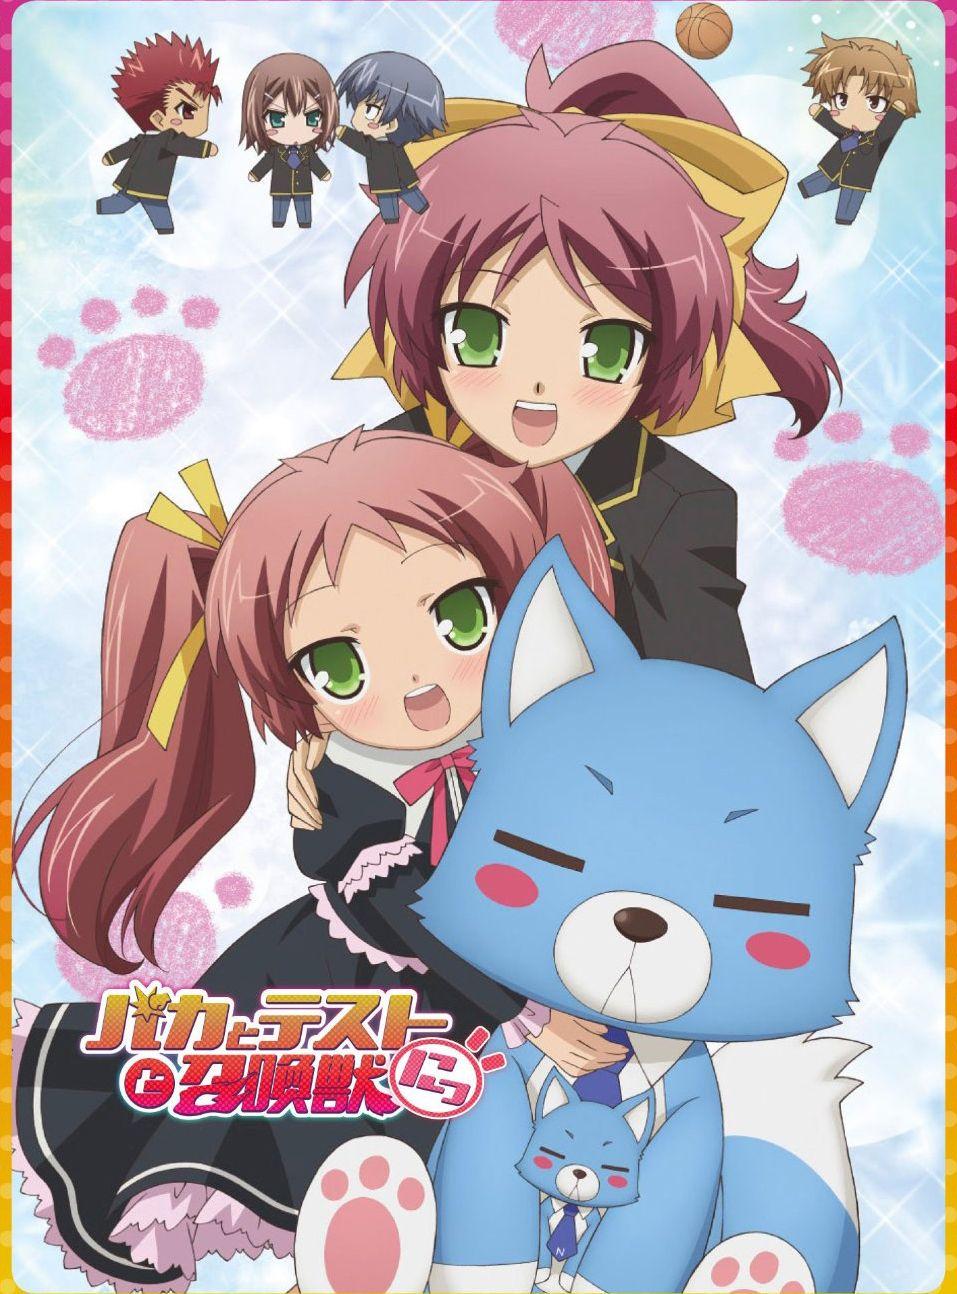 Anime Profile: Baka and Test: Summon the Beasts